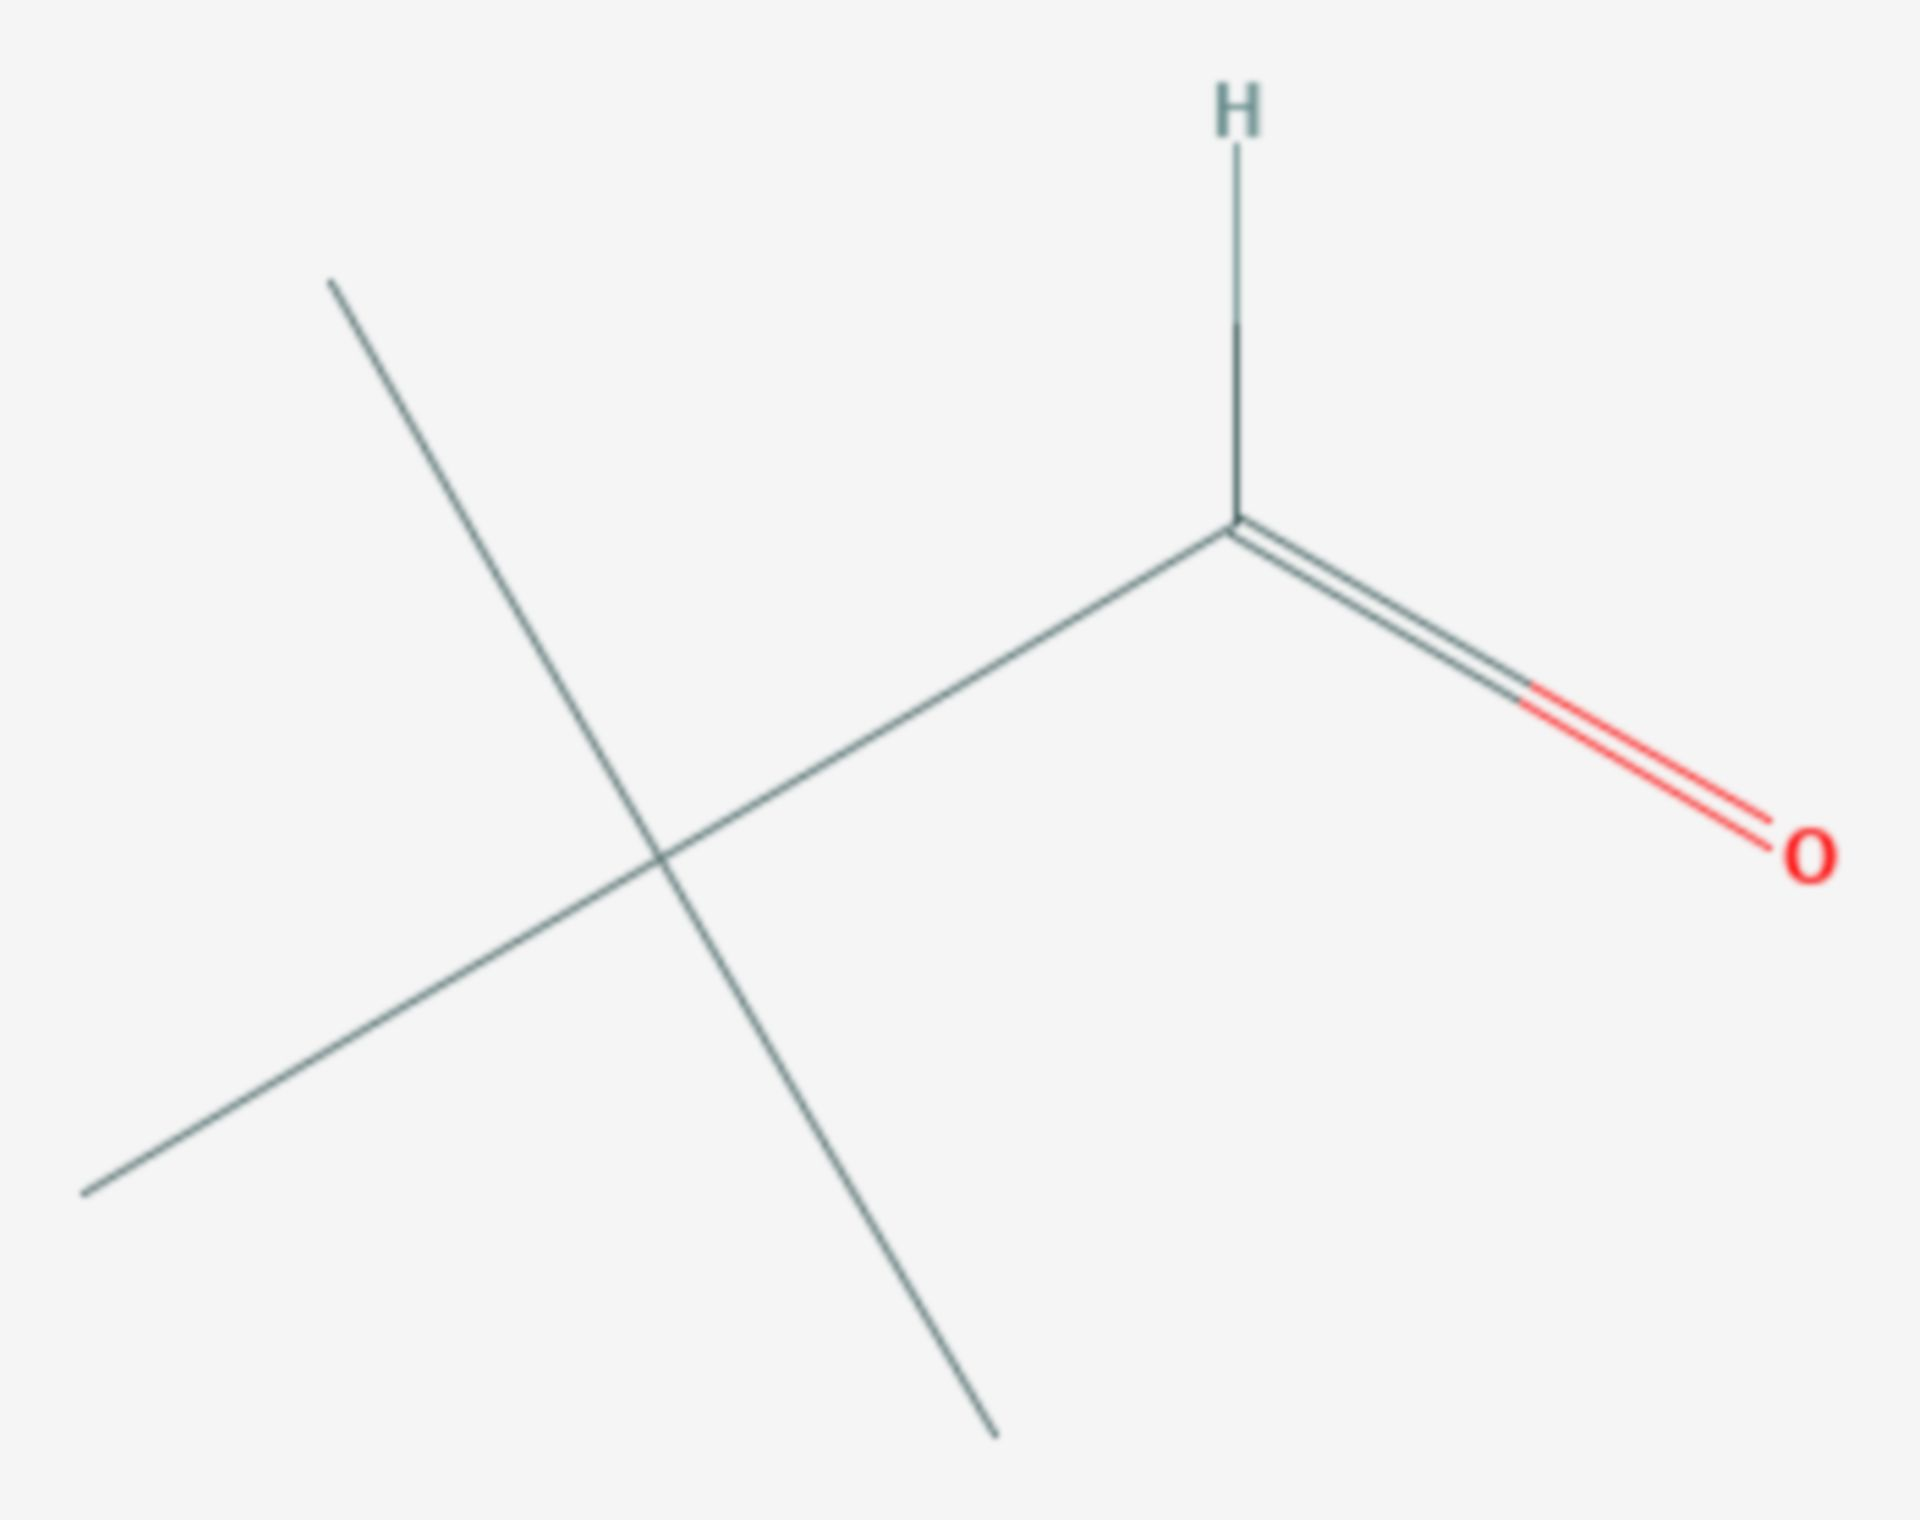 Pivalaldehyd (Strukturformel)